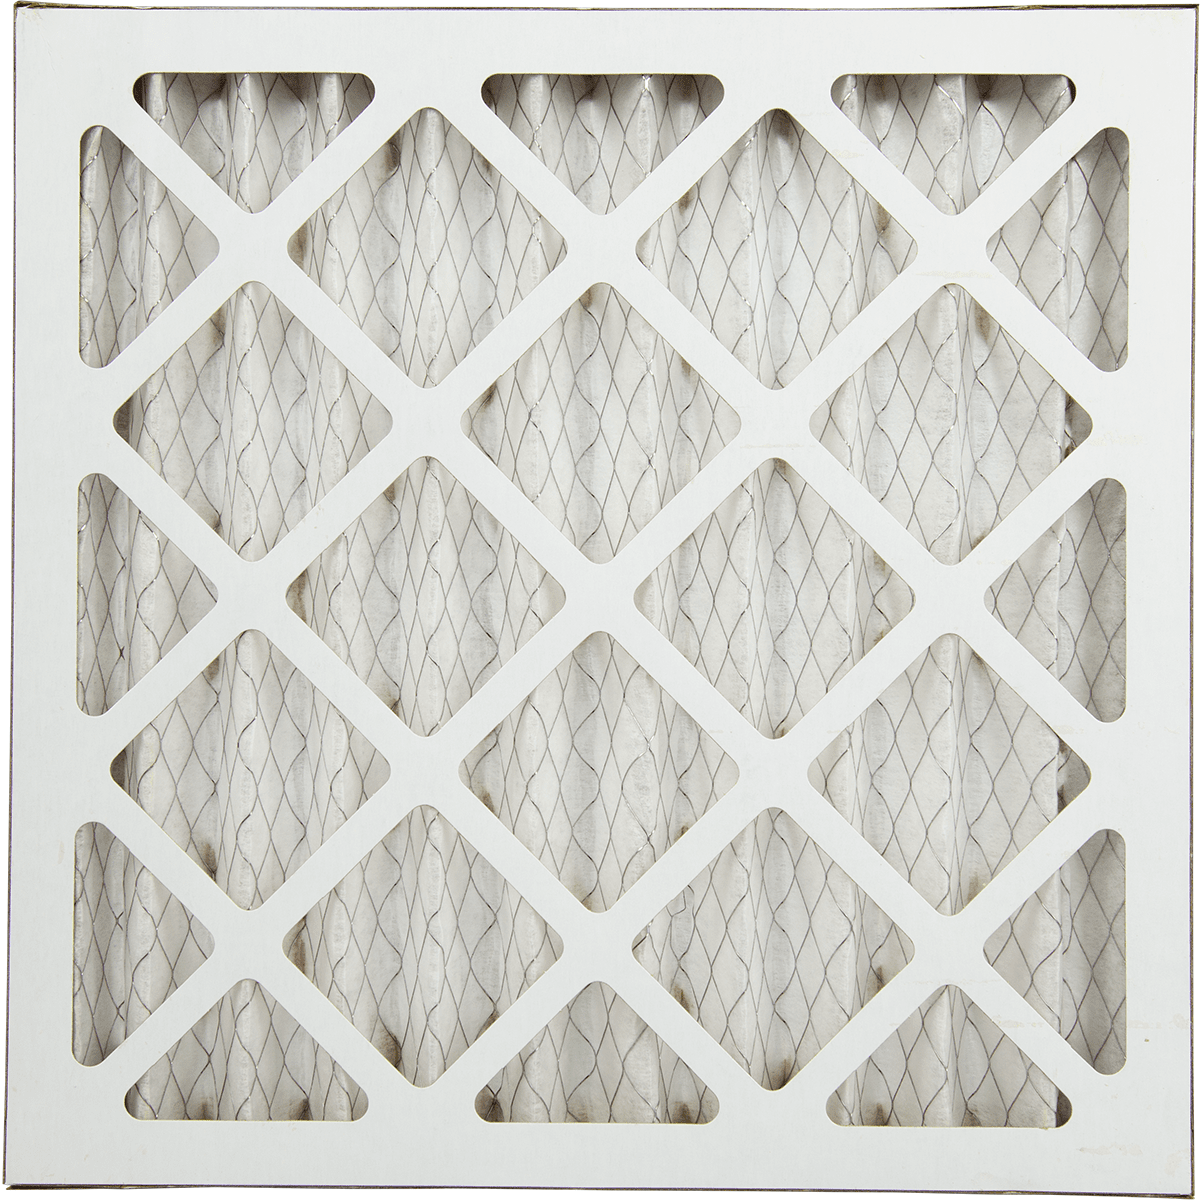 Hi-E Dry MERV 8 Dehumidifier Filter (16 x 16 x 2)